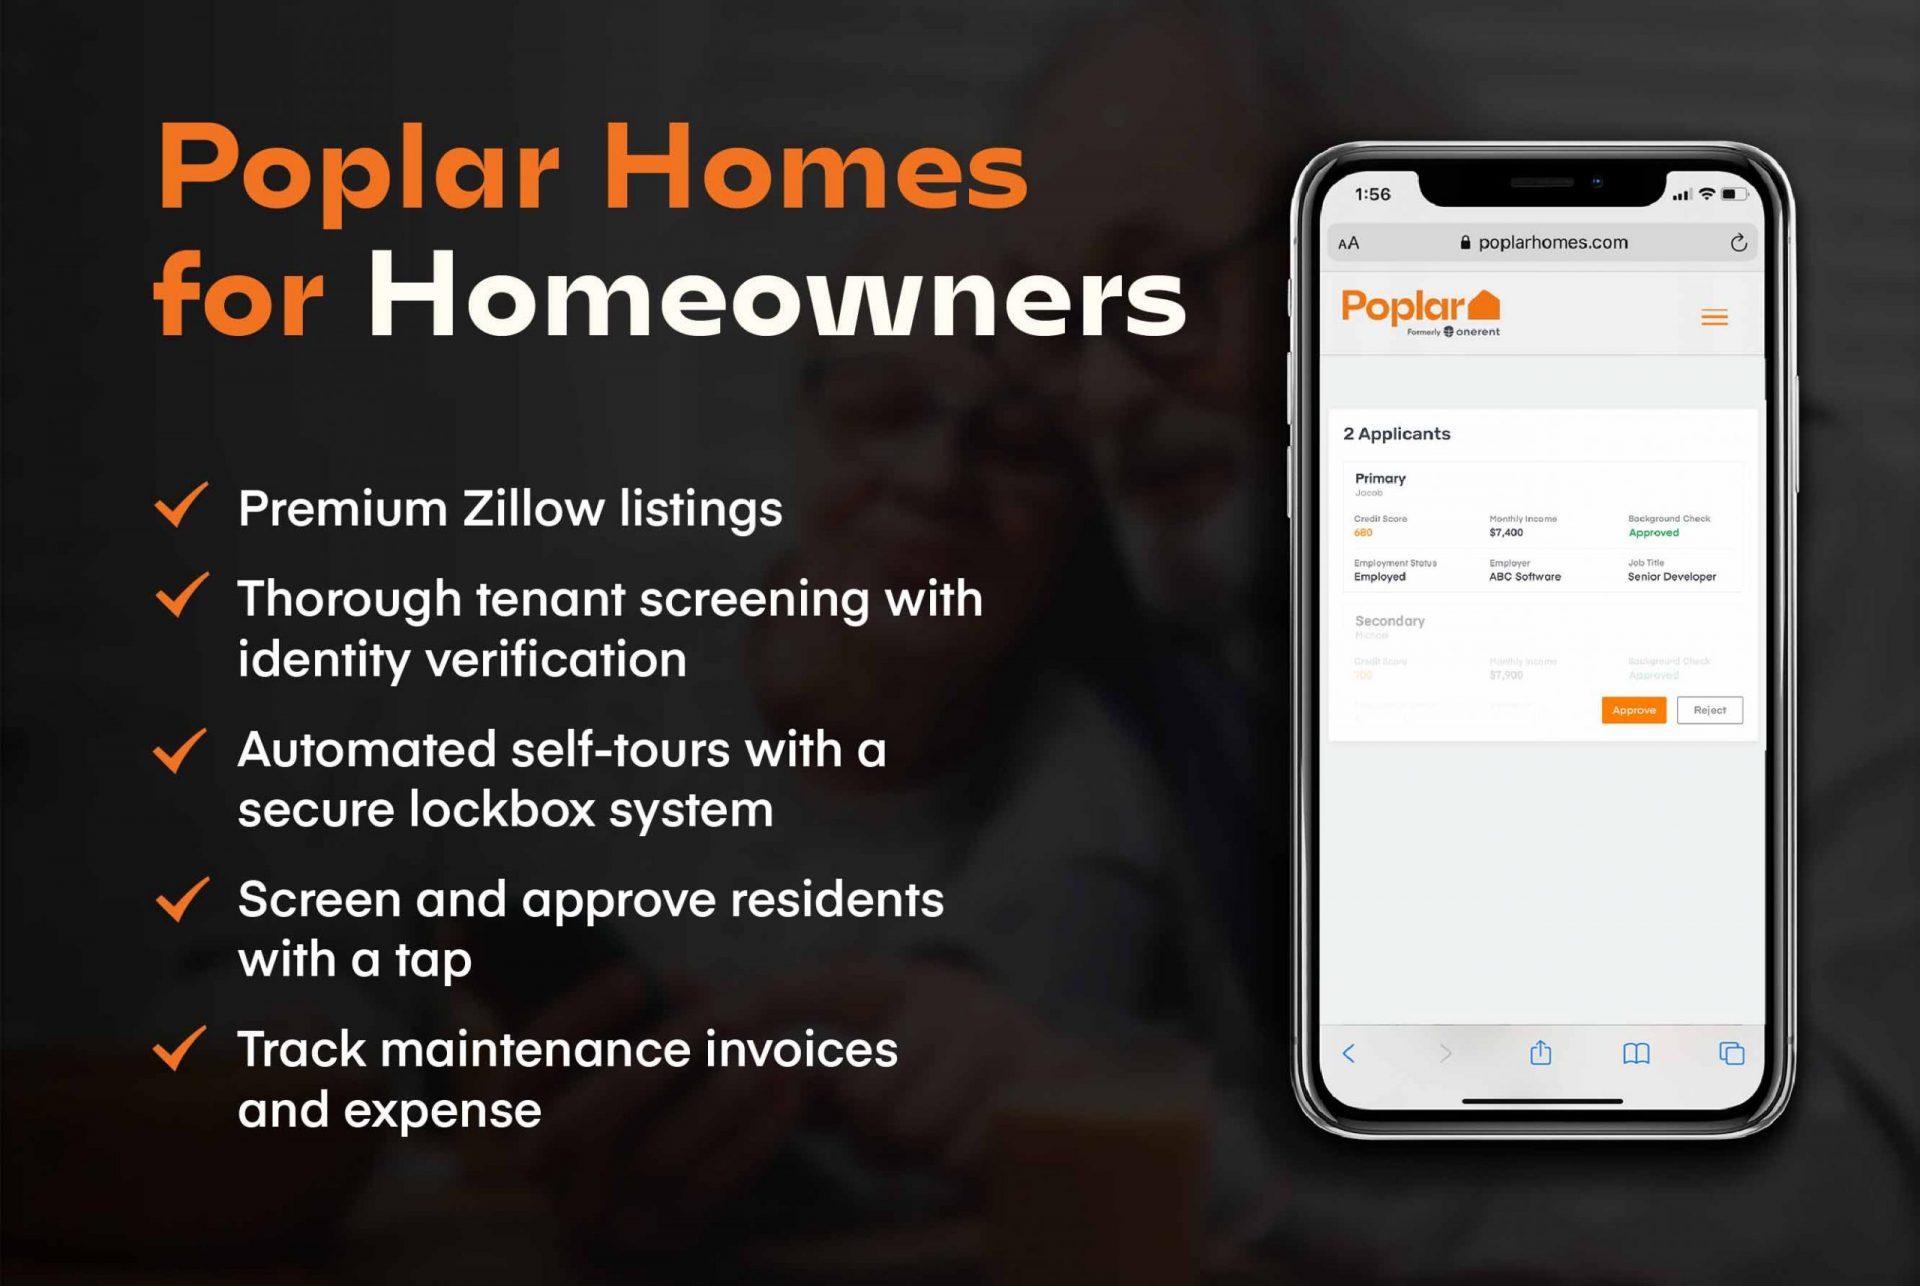 poplar homes for homesowners